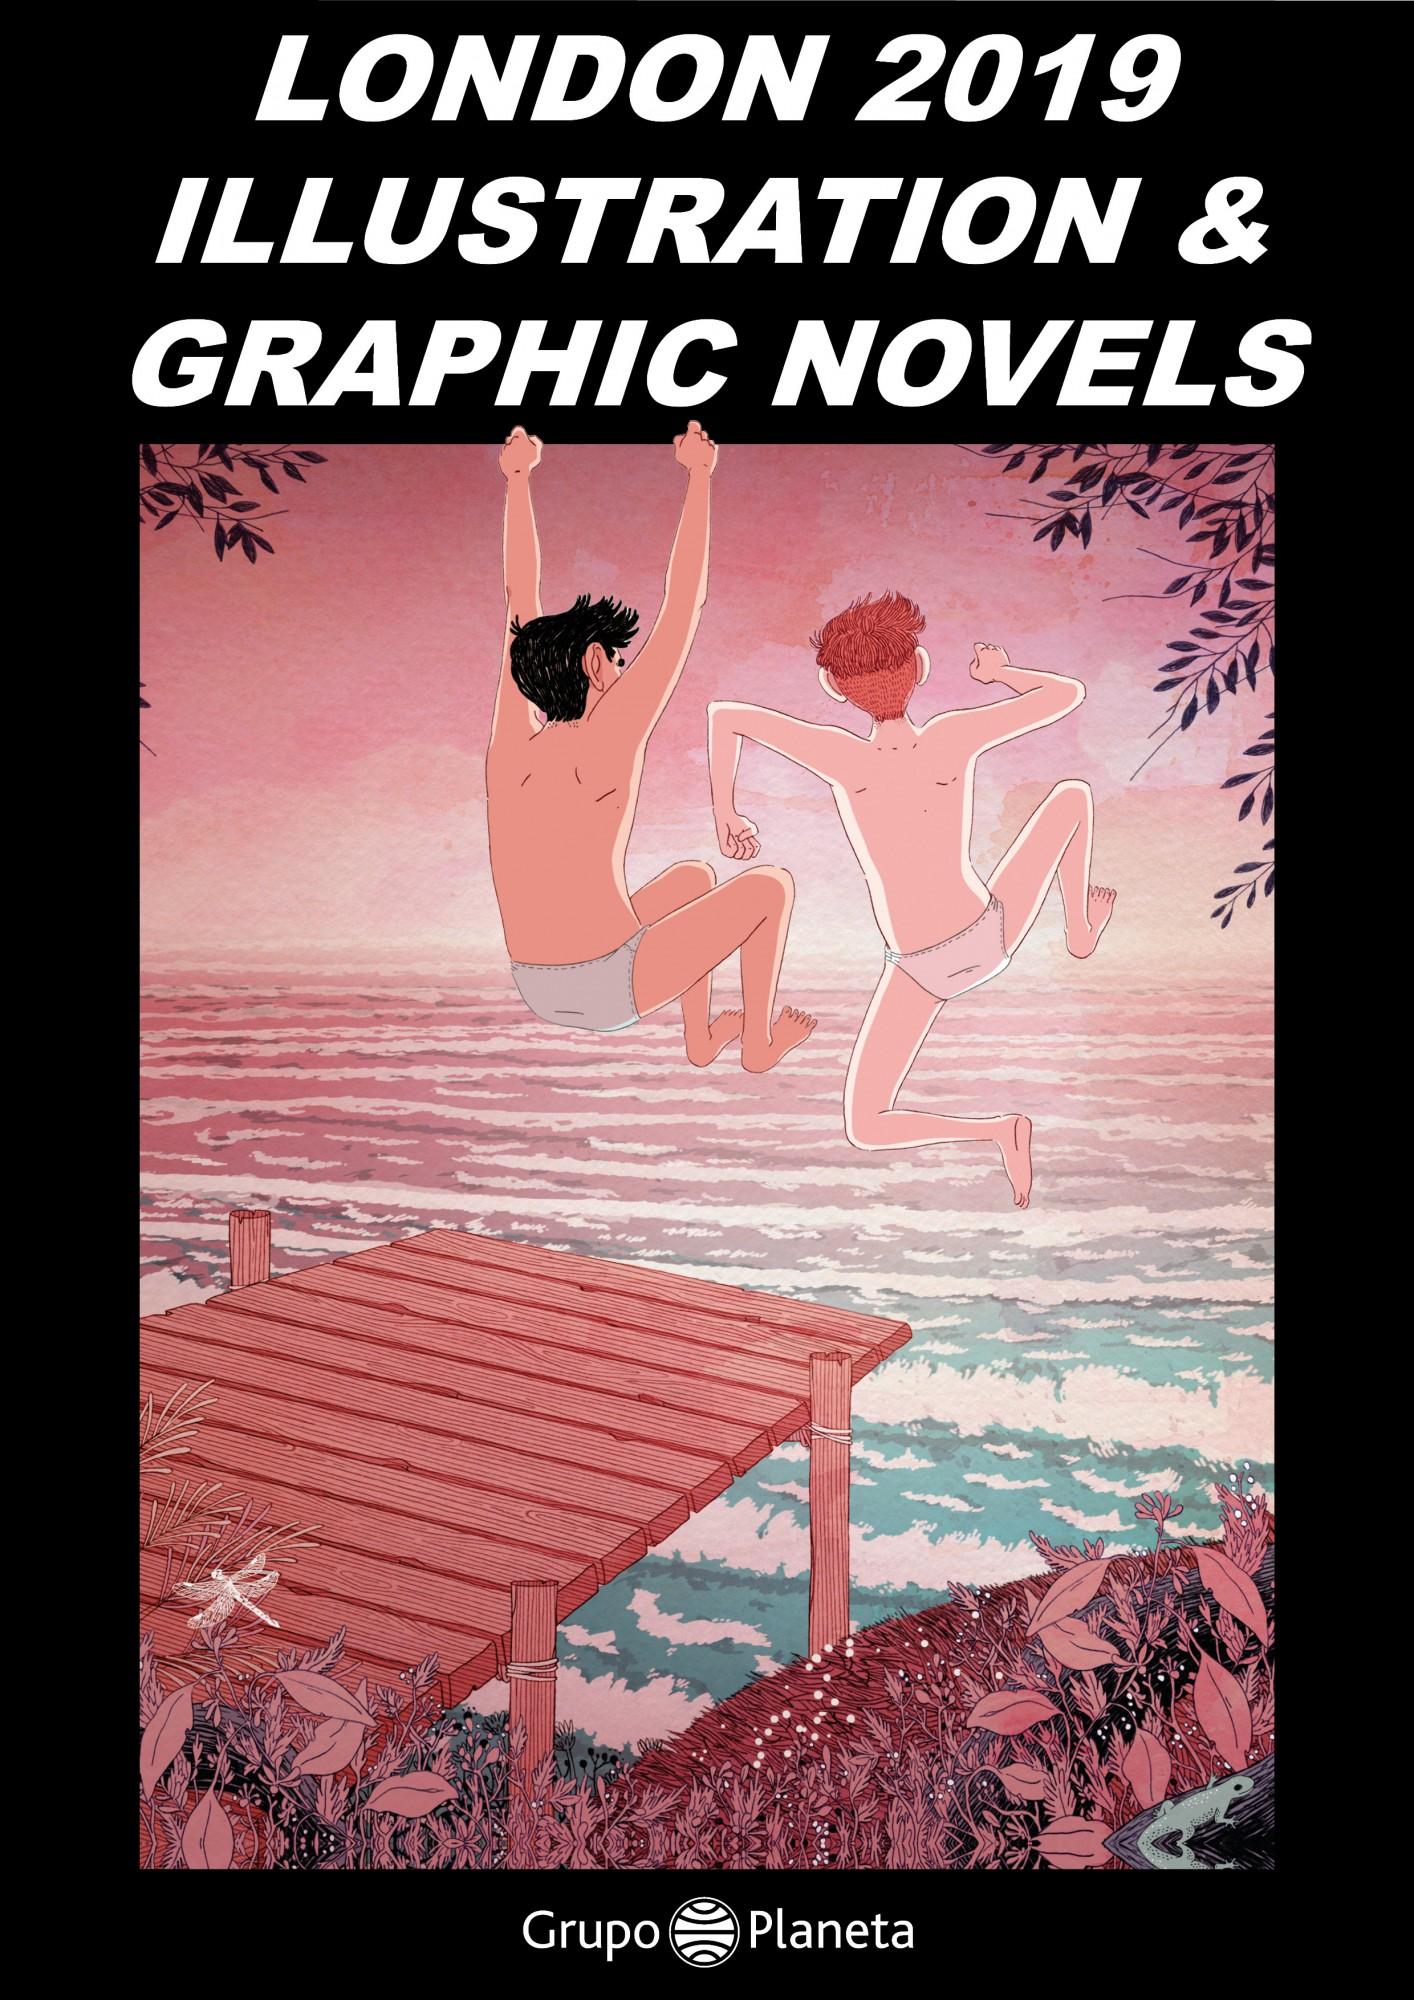 London 2019 Illustration & Graphic Novels